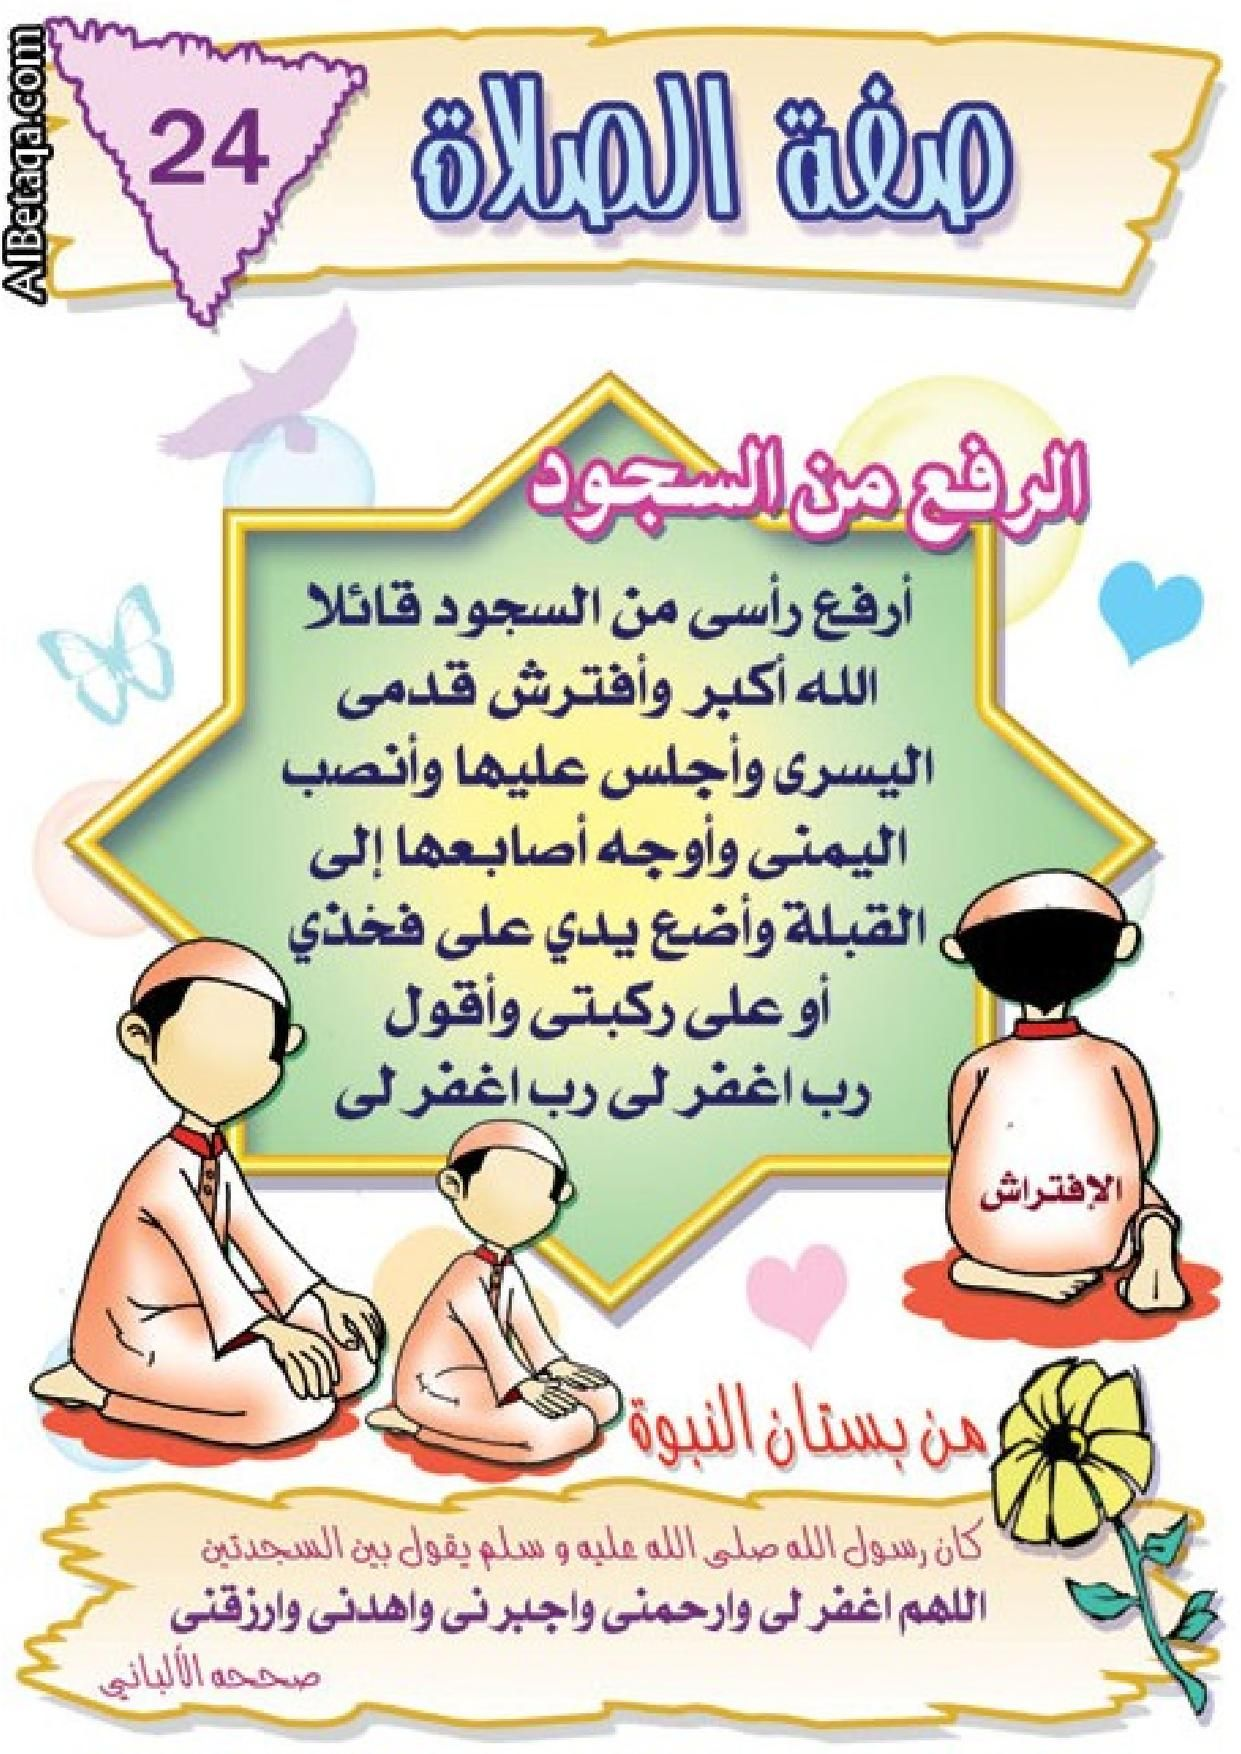 0197 كتاب صيغة مصورة اقرا اونلاين أحكام الصلاة Free Download Borrow And Streaming Internet Archive Islam For Kids Islam Beliefs Learn Islam